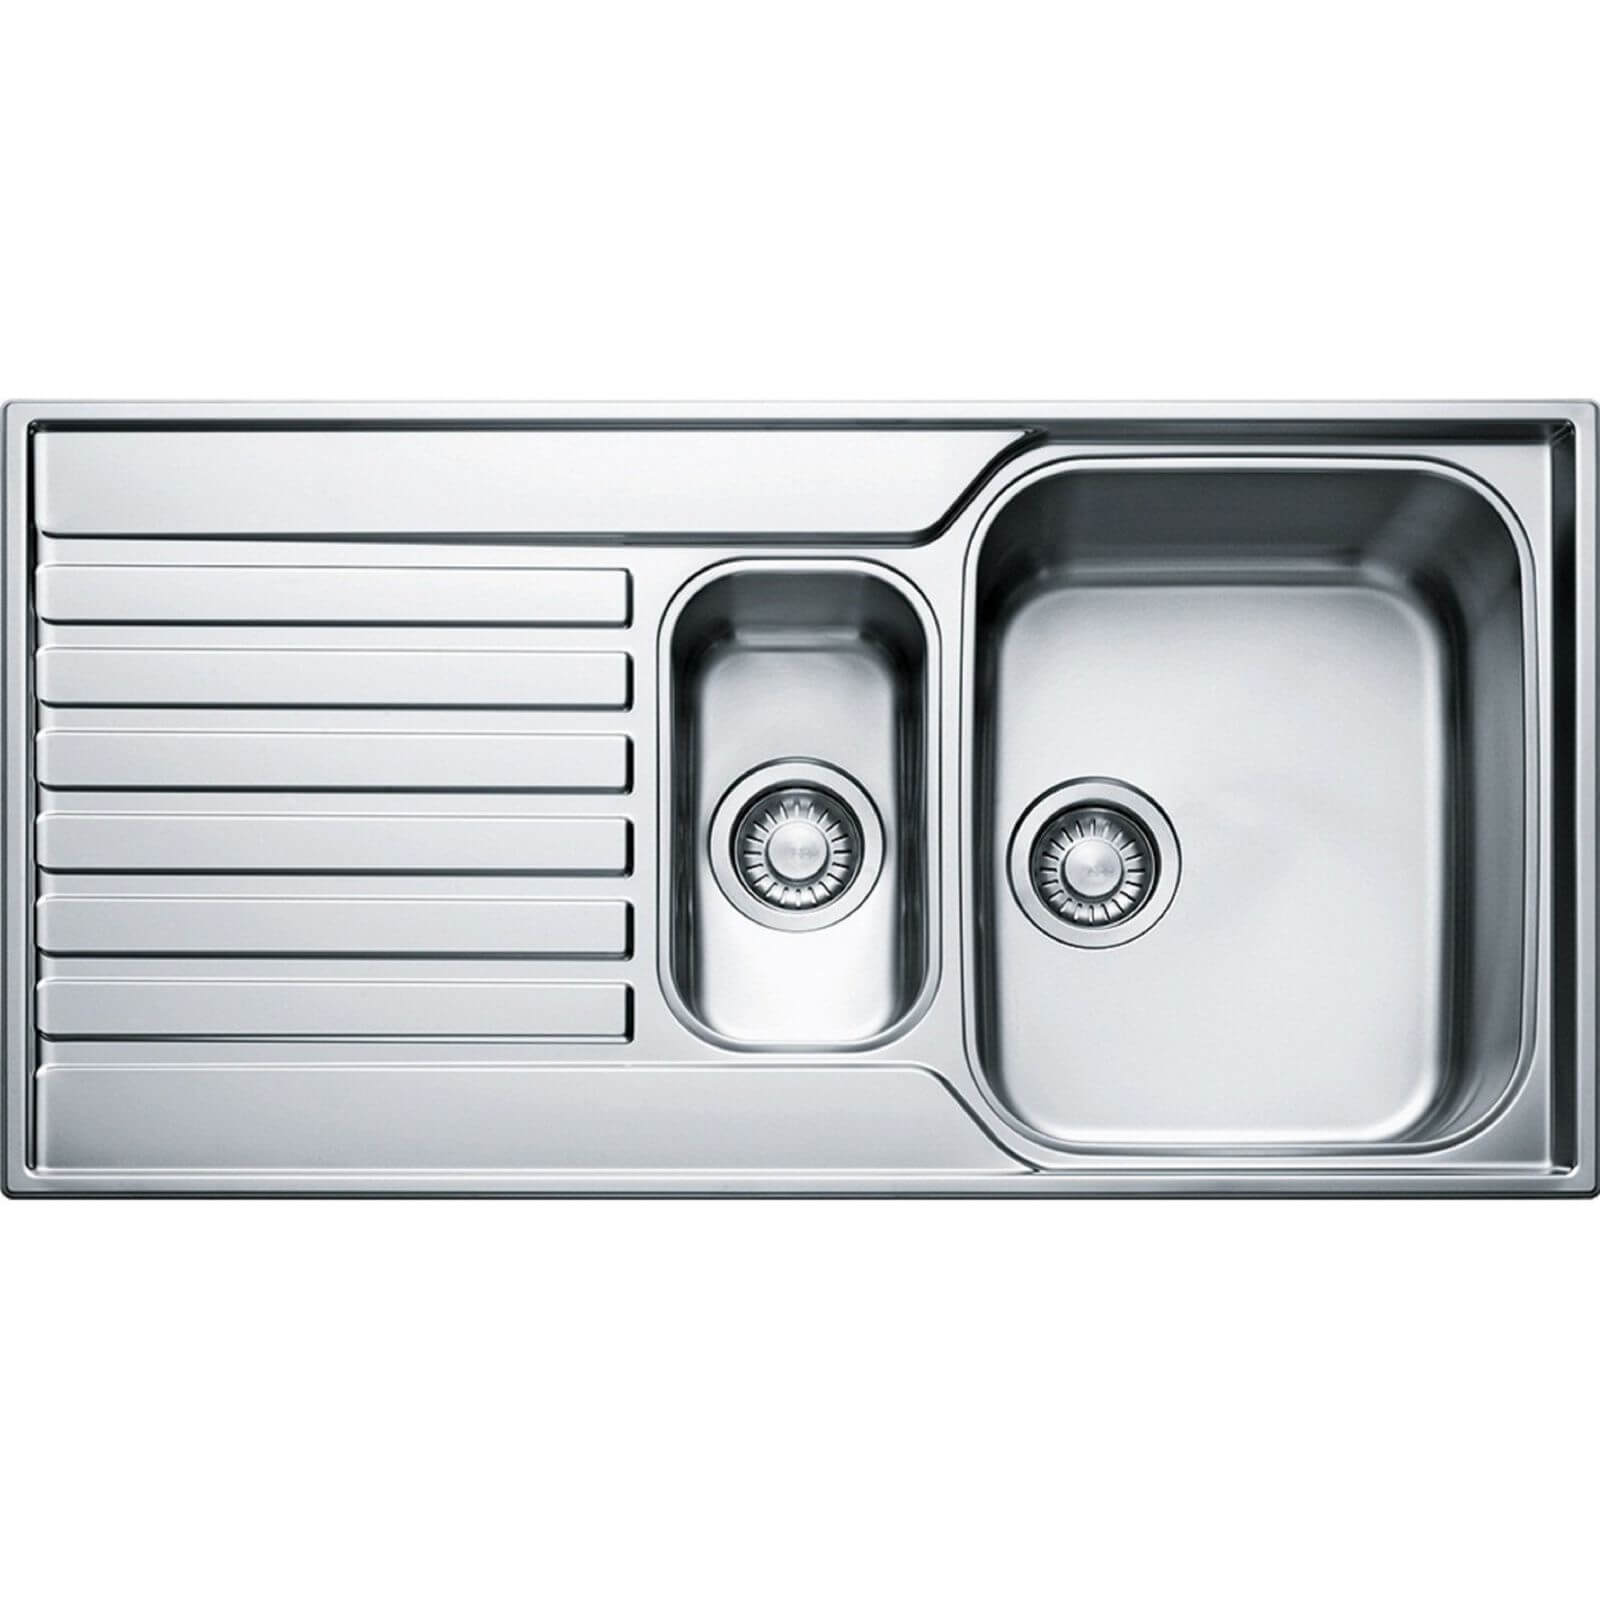 Franke Ascona Reversible Kitchen Sink - 1.5 Bowl